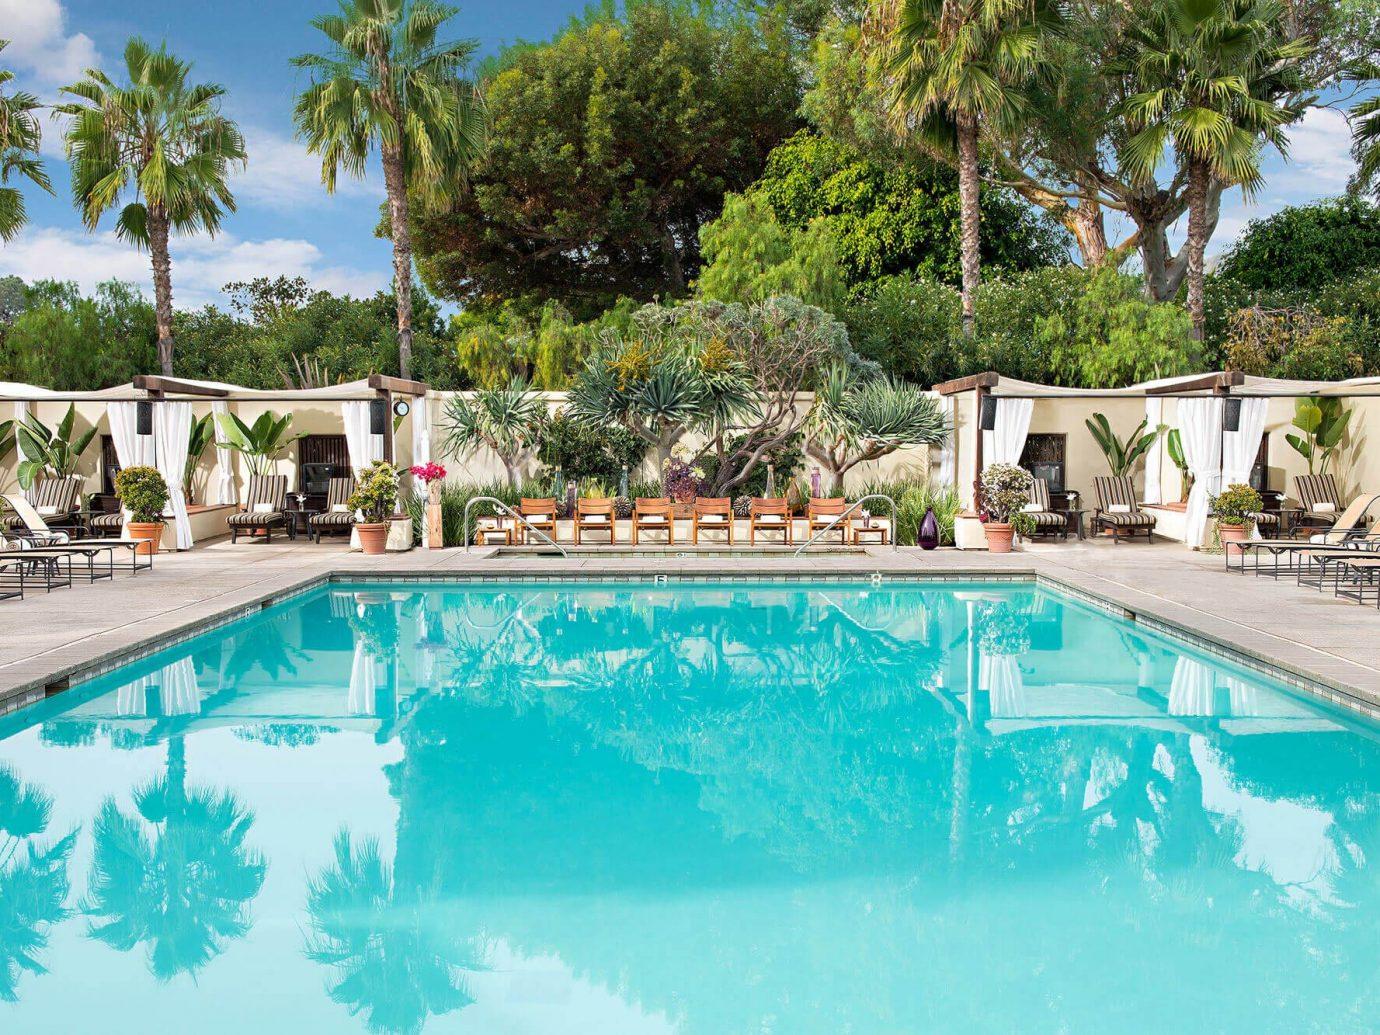 pool at Estancia La Jolla Hotel & Spa